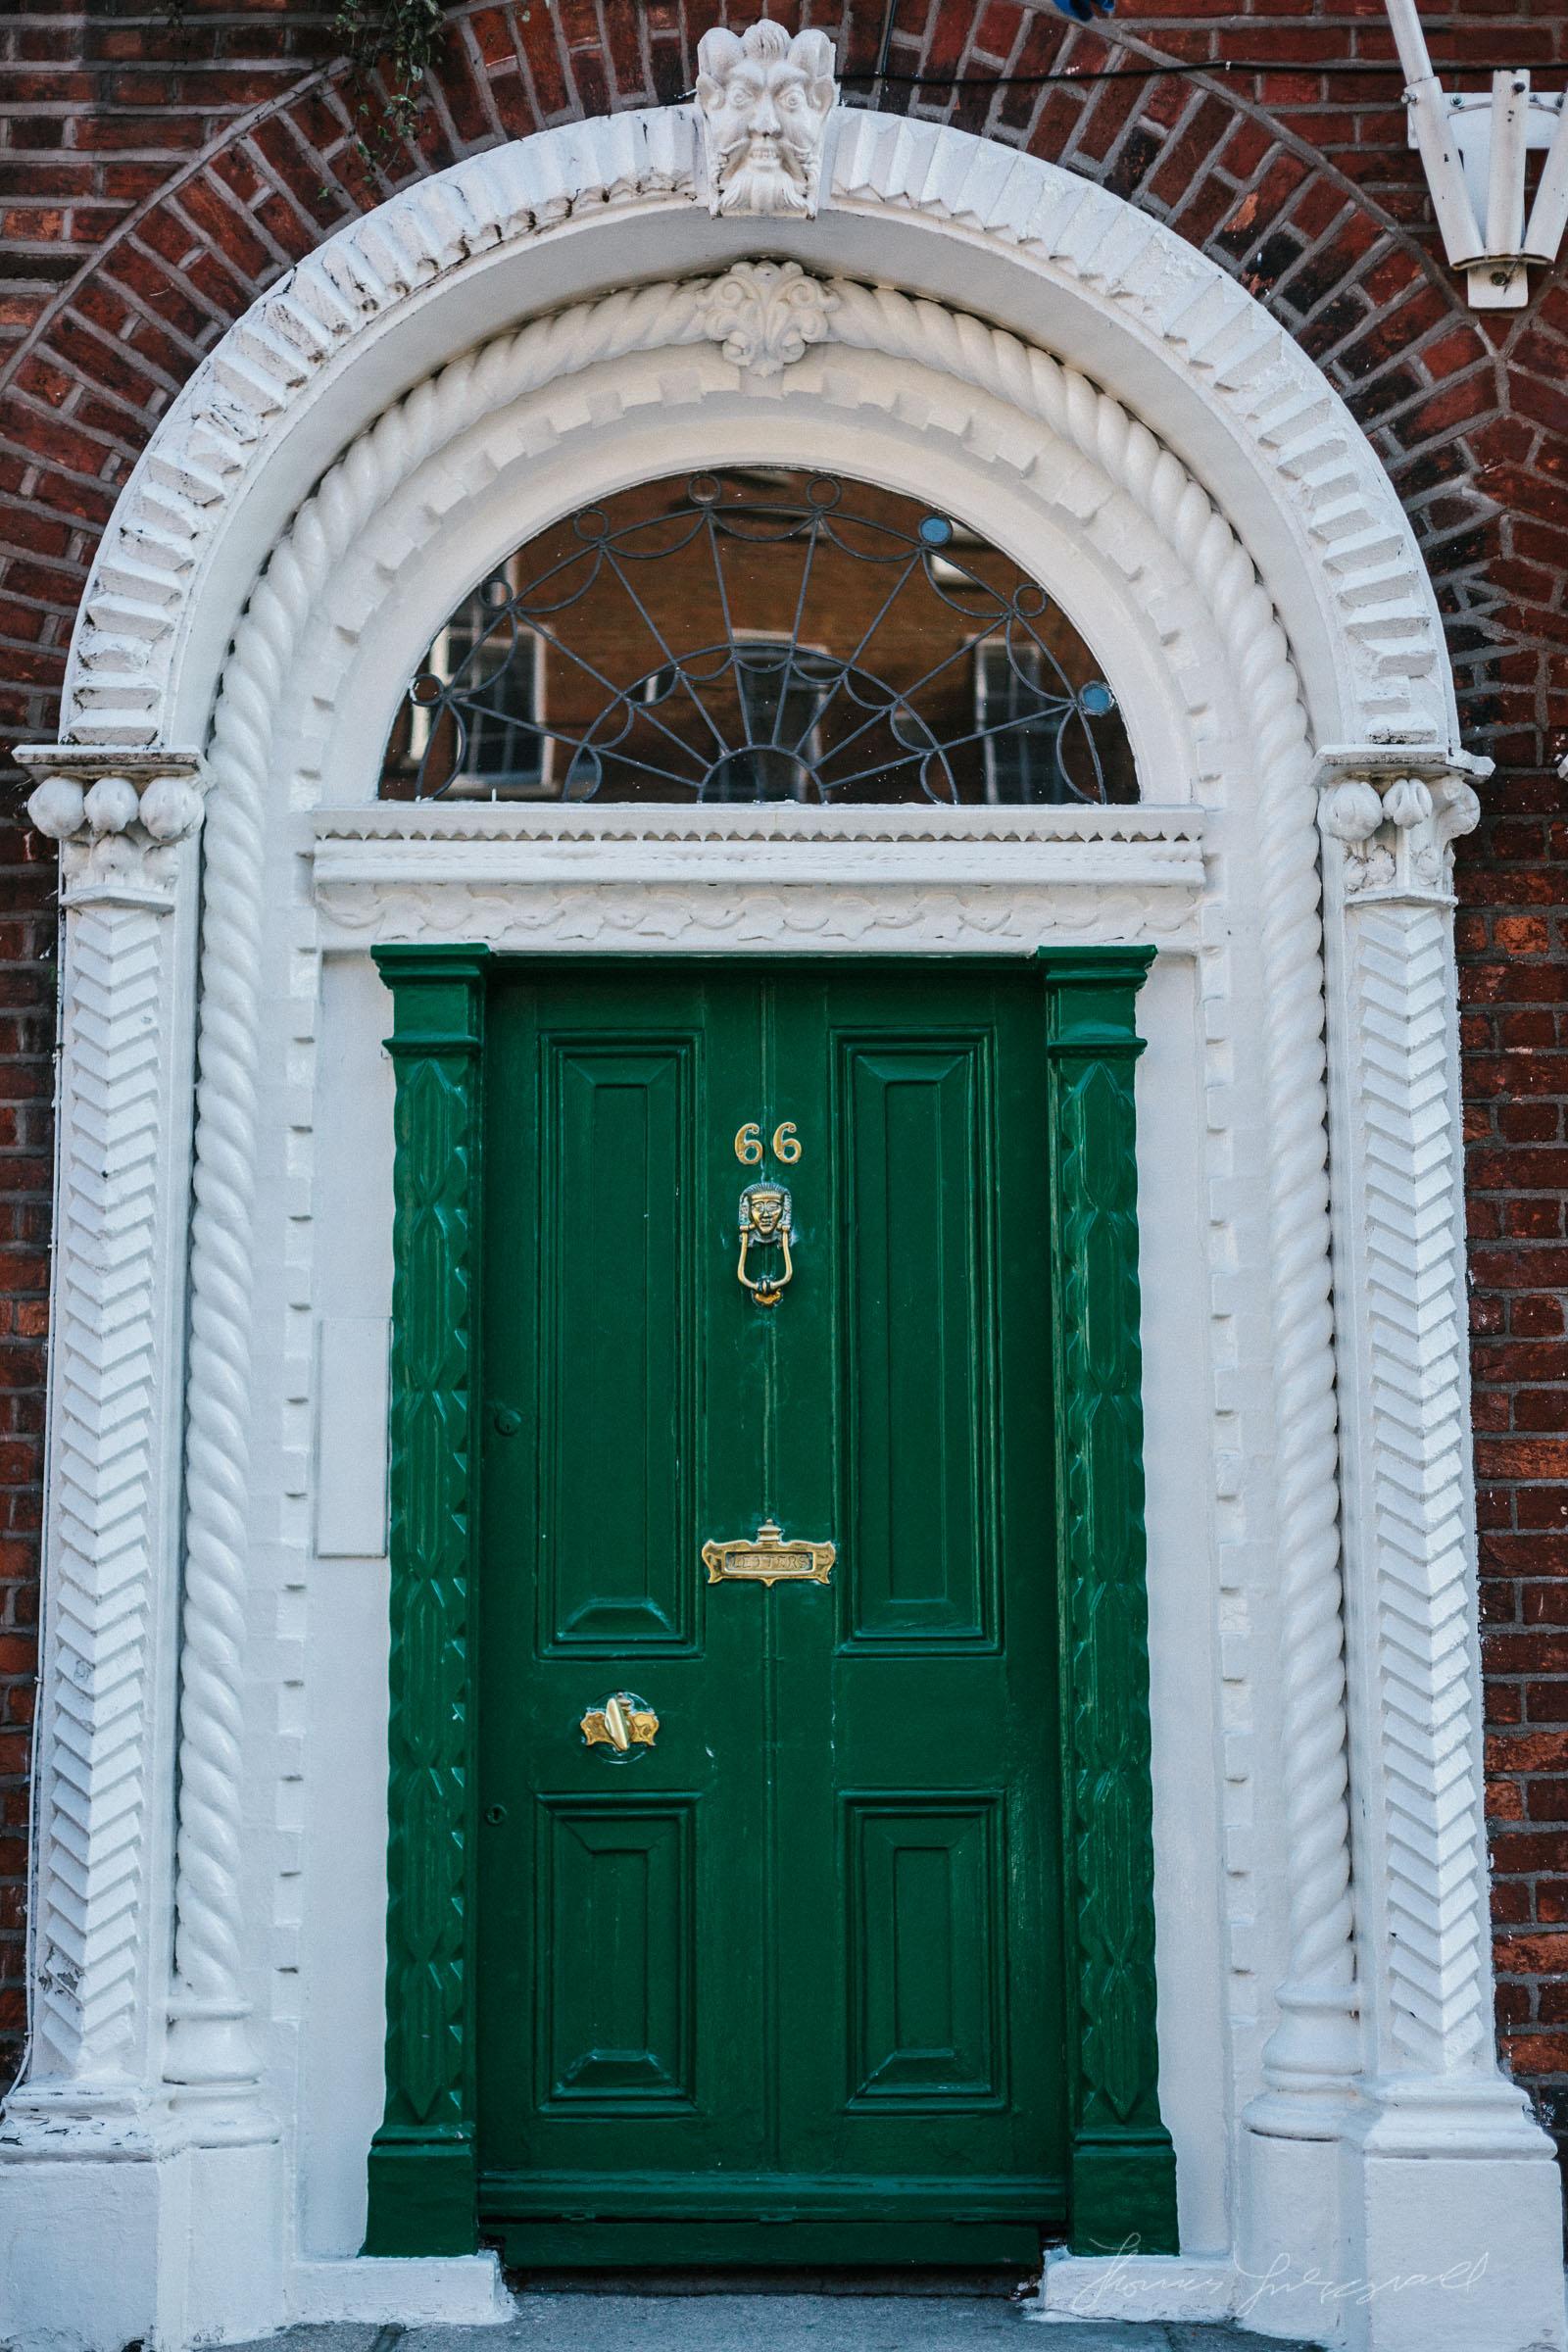 Streets-of-Dublin-Photo-2560.jpg